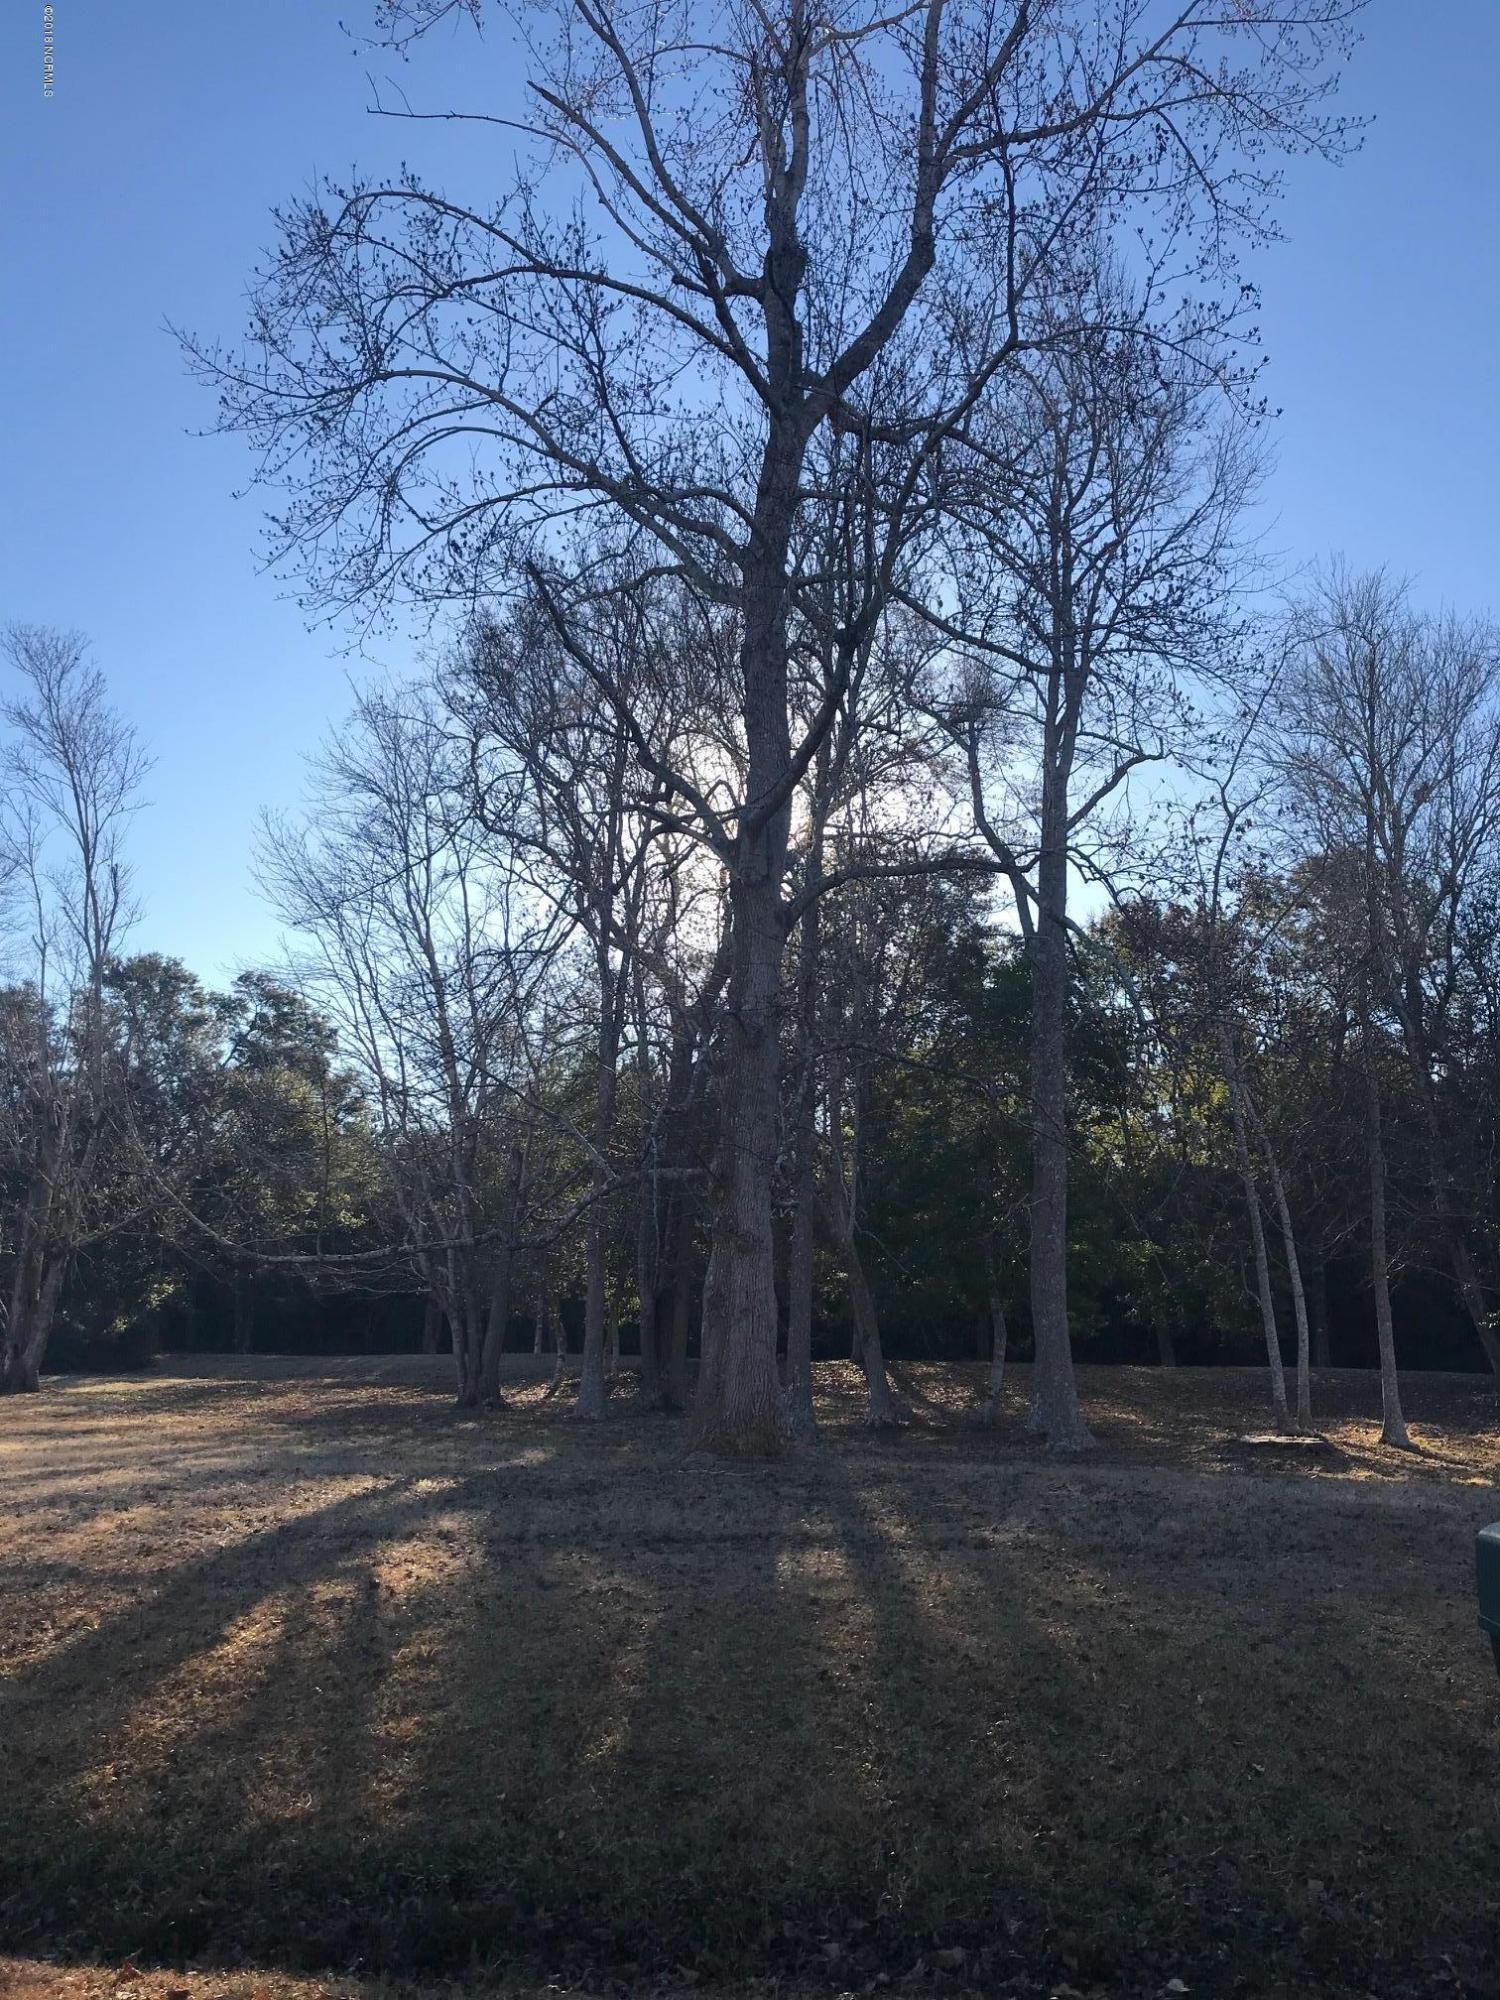 1781 Sandalwood Drive, Ocean Isle Beach, North Carolina 28469, ,Residential land,For sale,Sandalwood,100095587